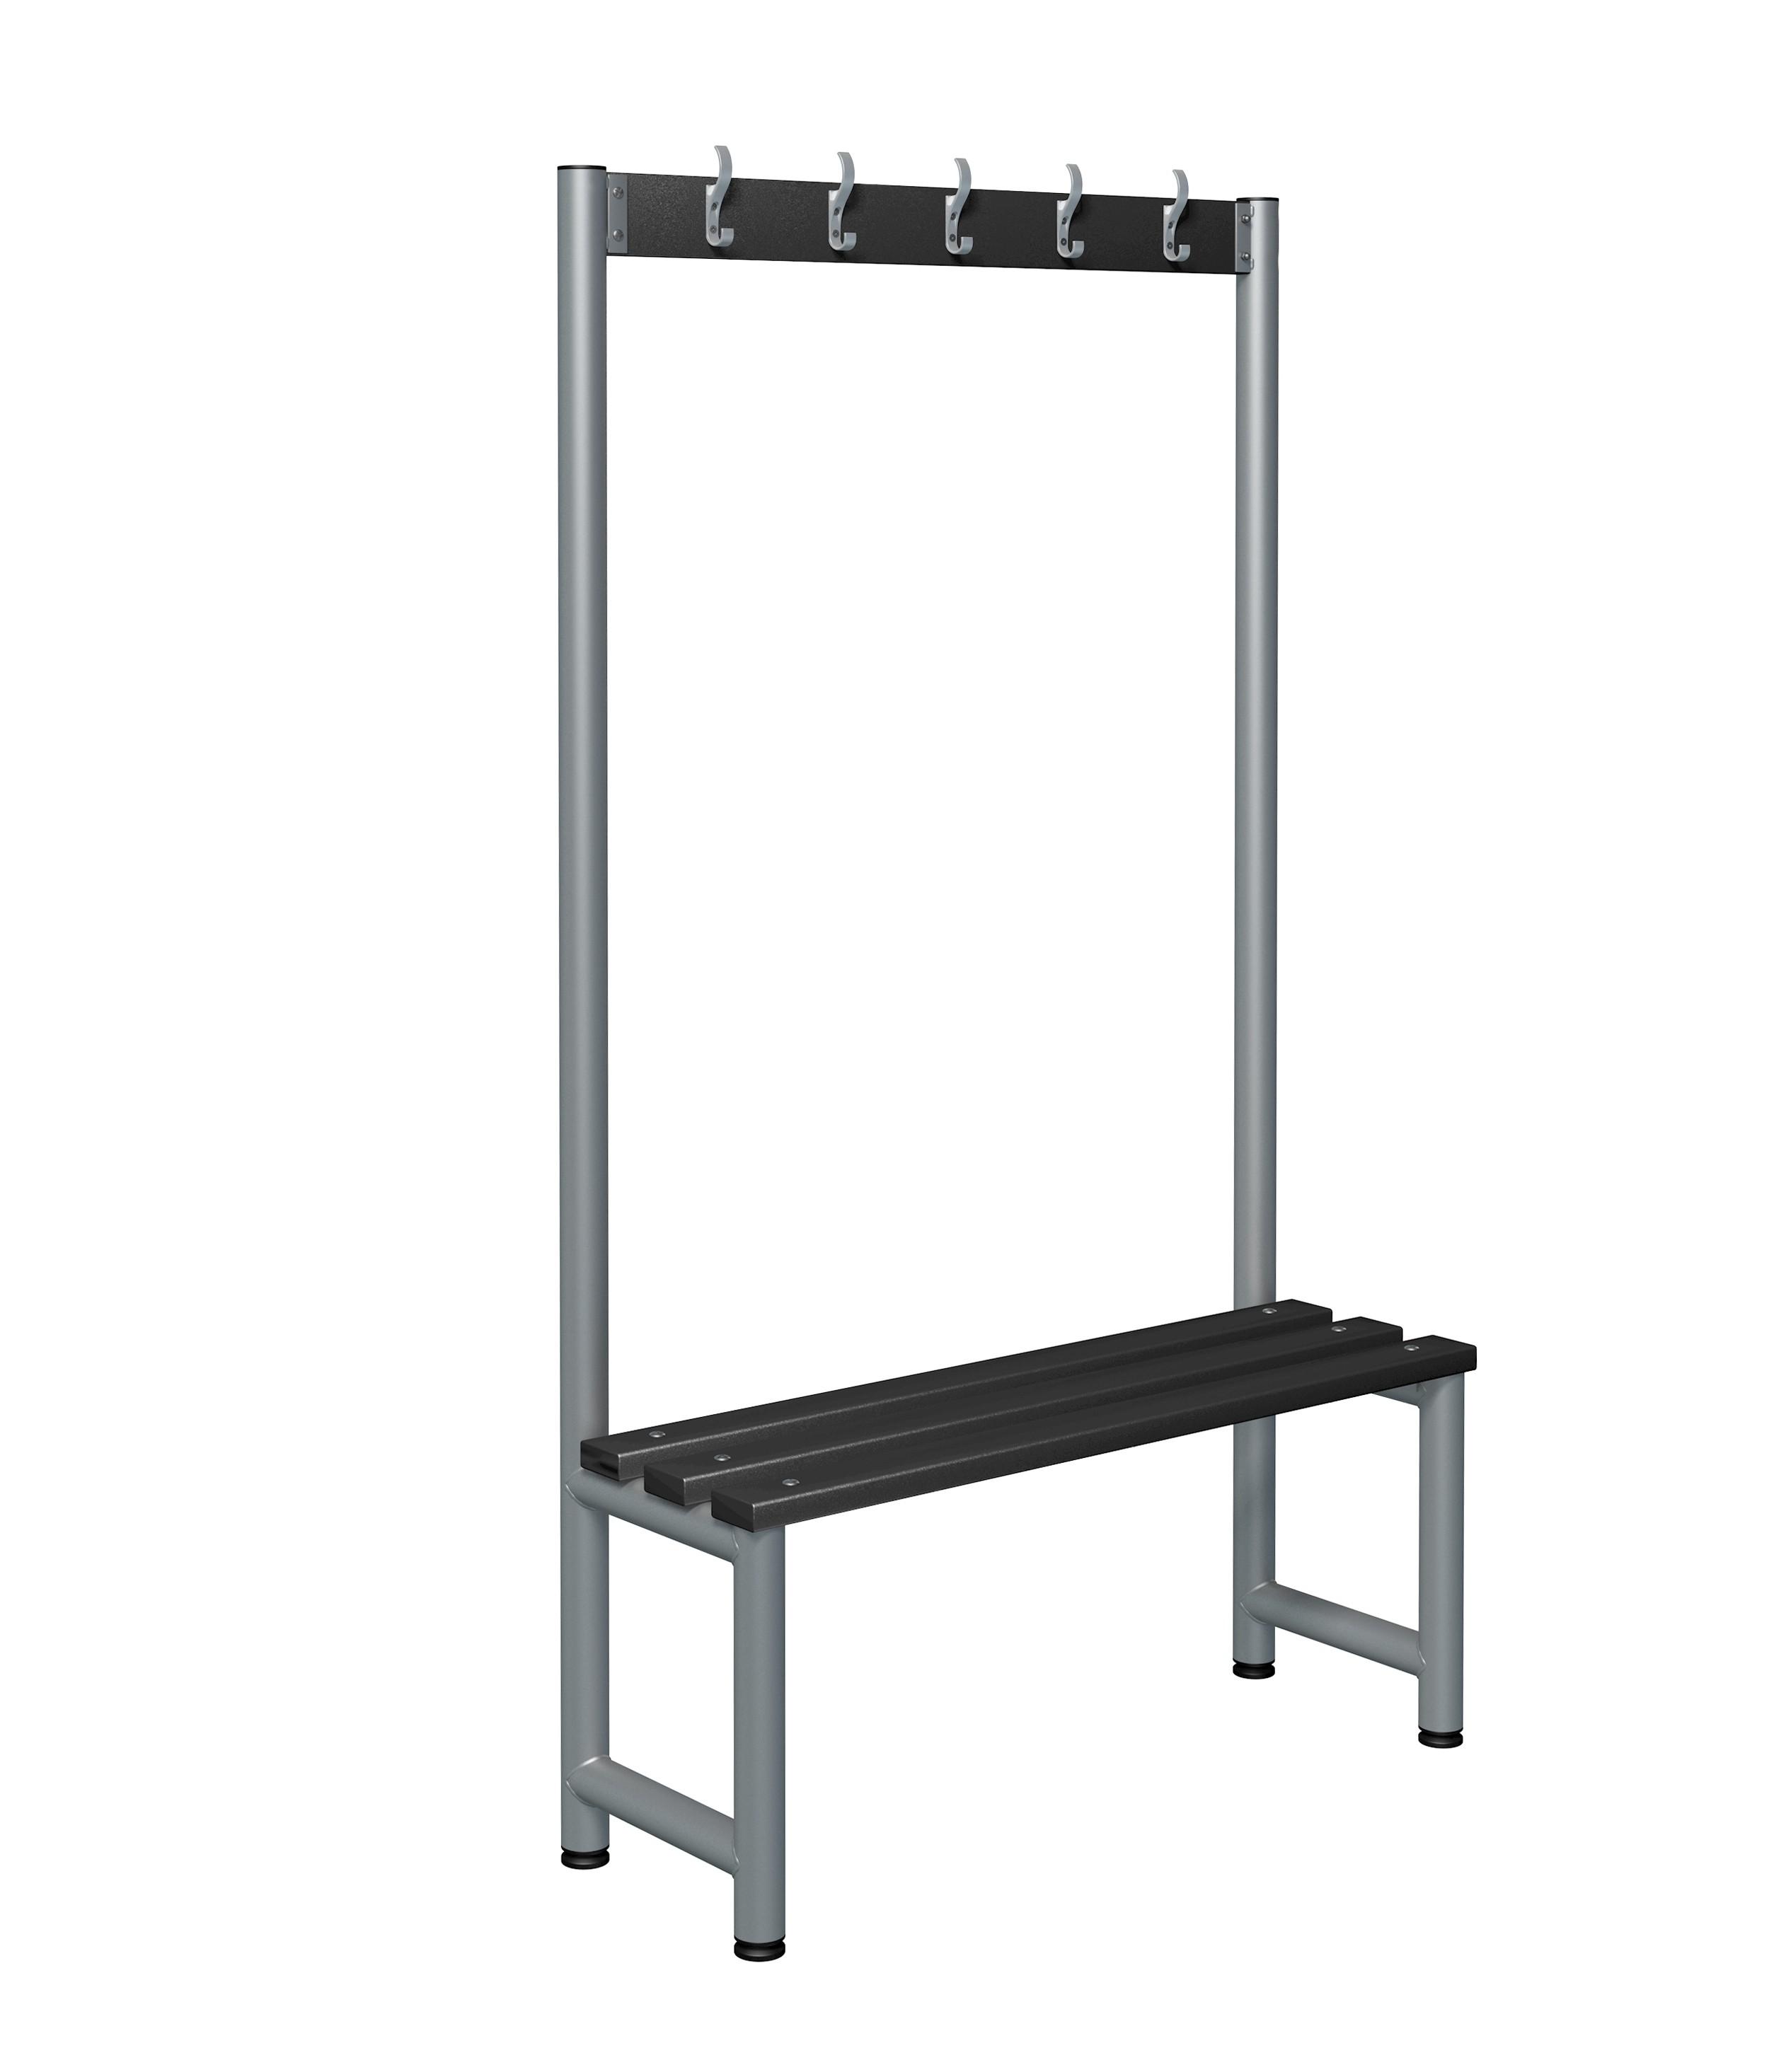 Single Sided Hook Bench Type D - Senior